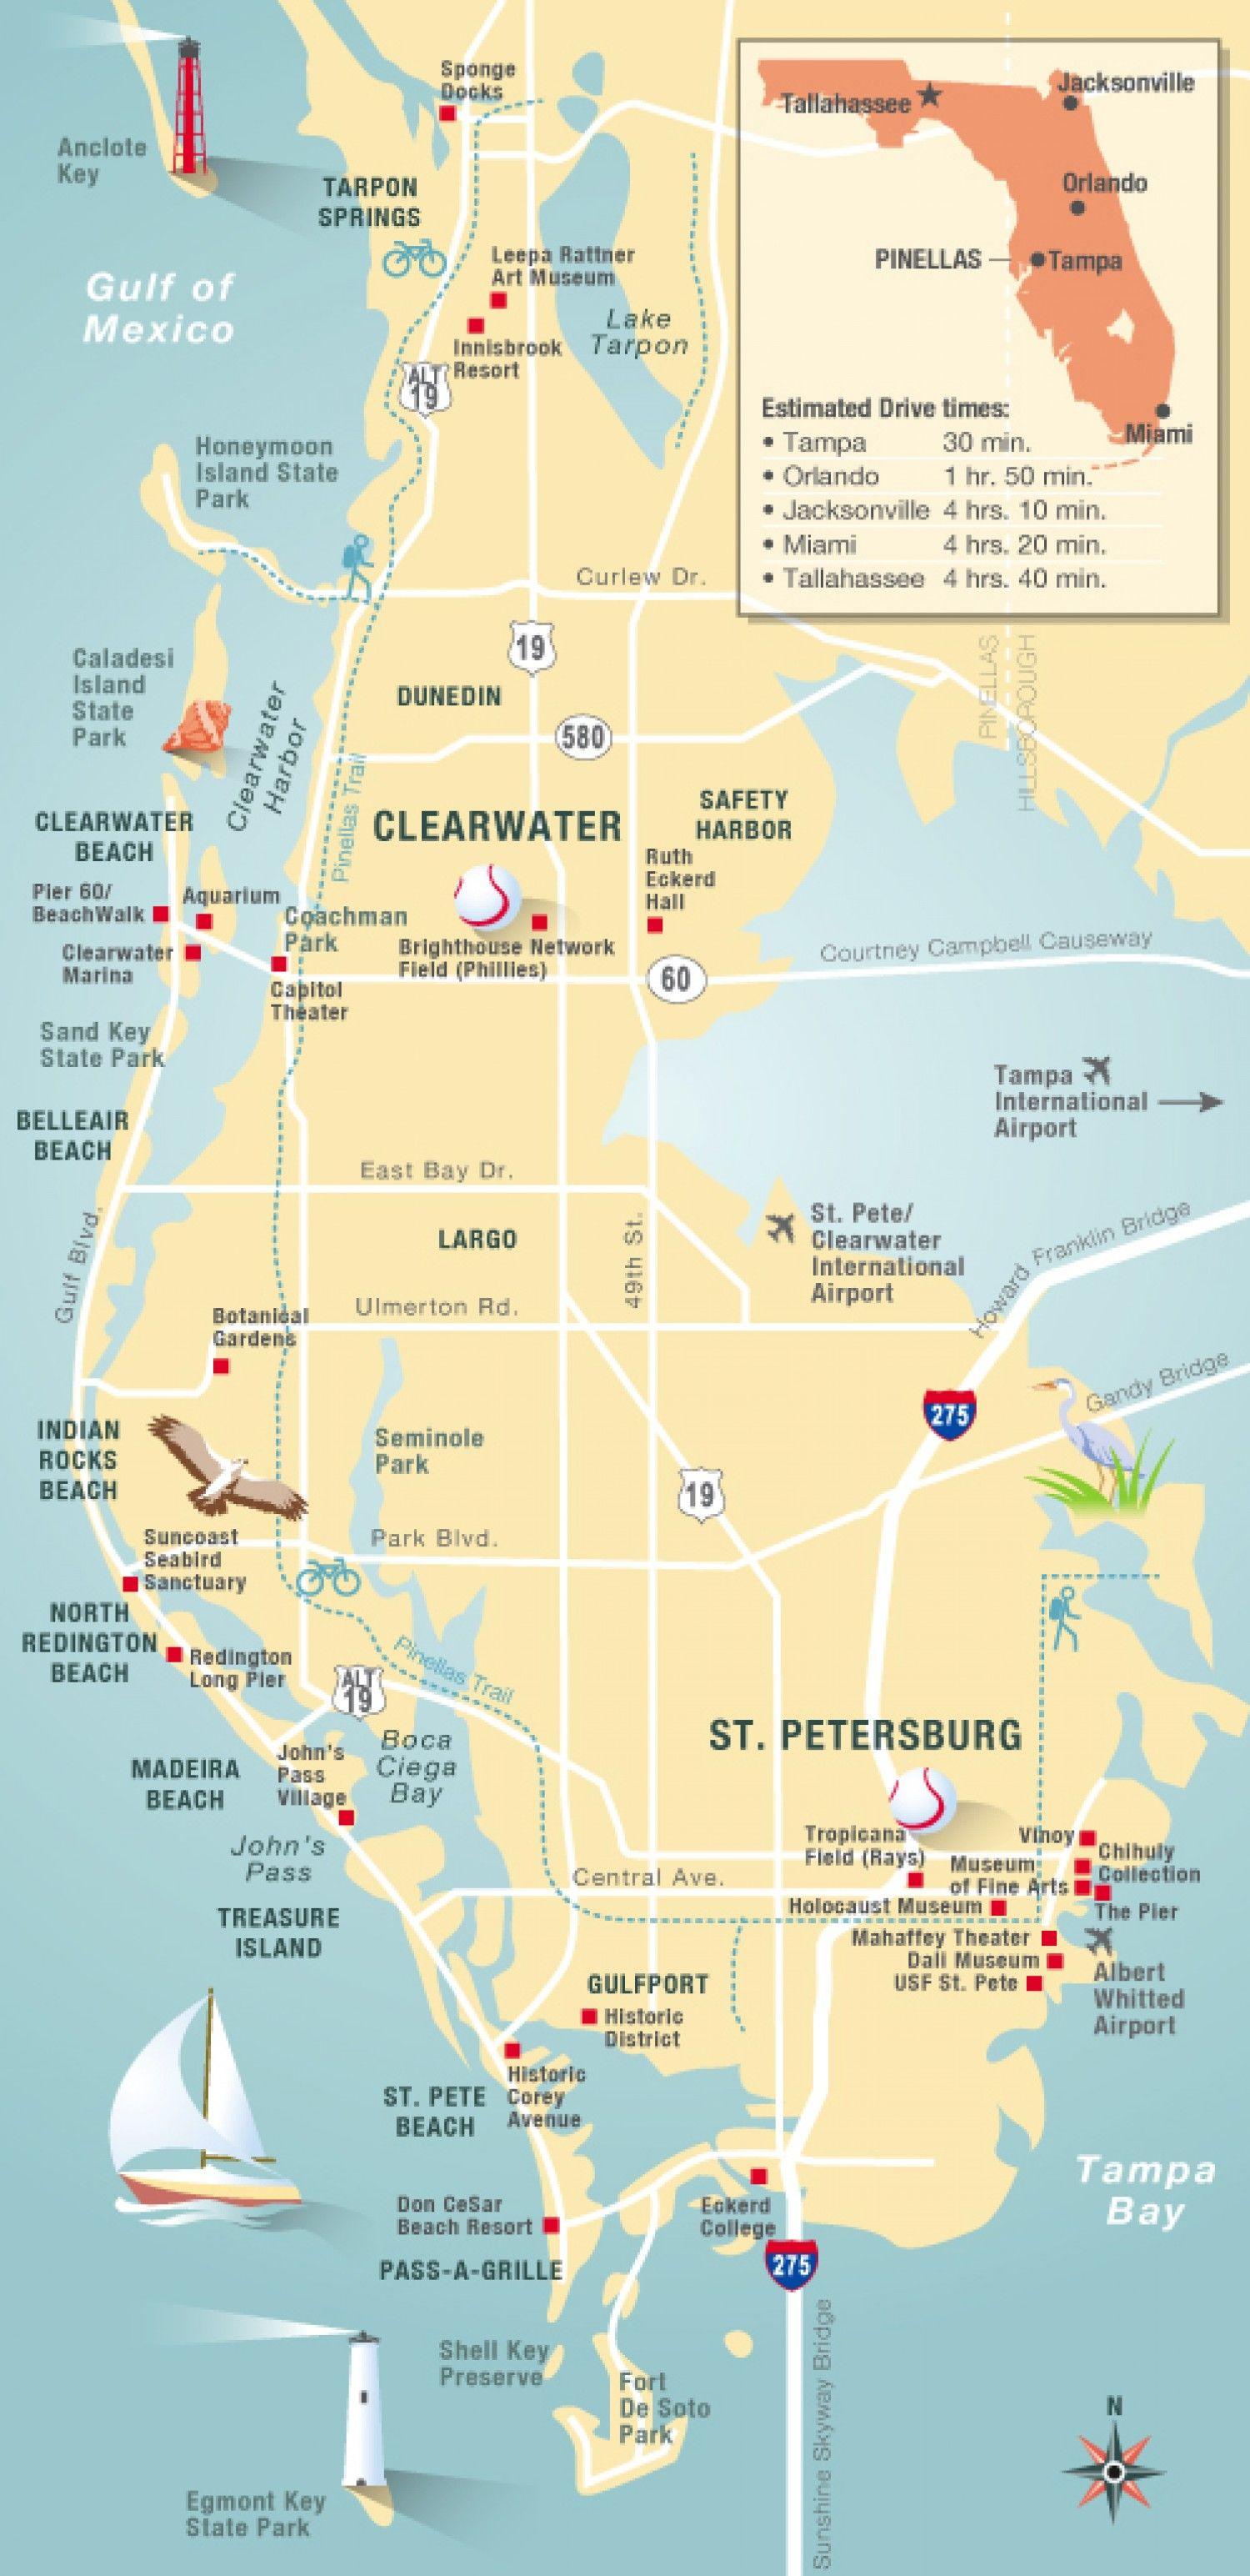 Pinellas County Map Clearwater, St Petersburg, Fl | Travel In 2019 - Belleair Beach Florida Map